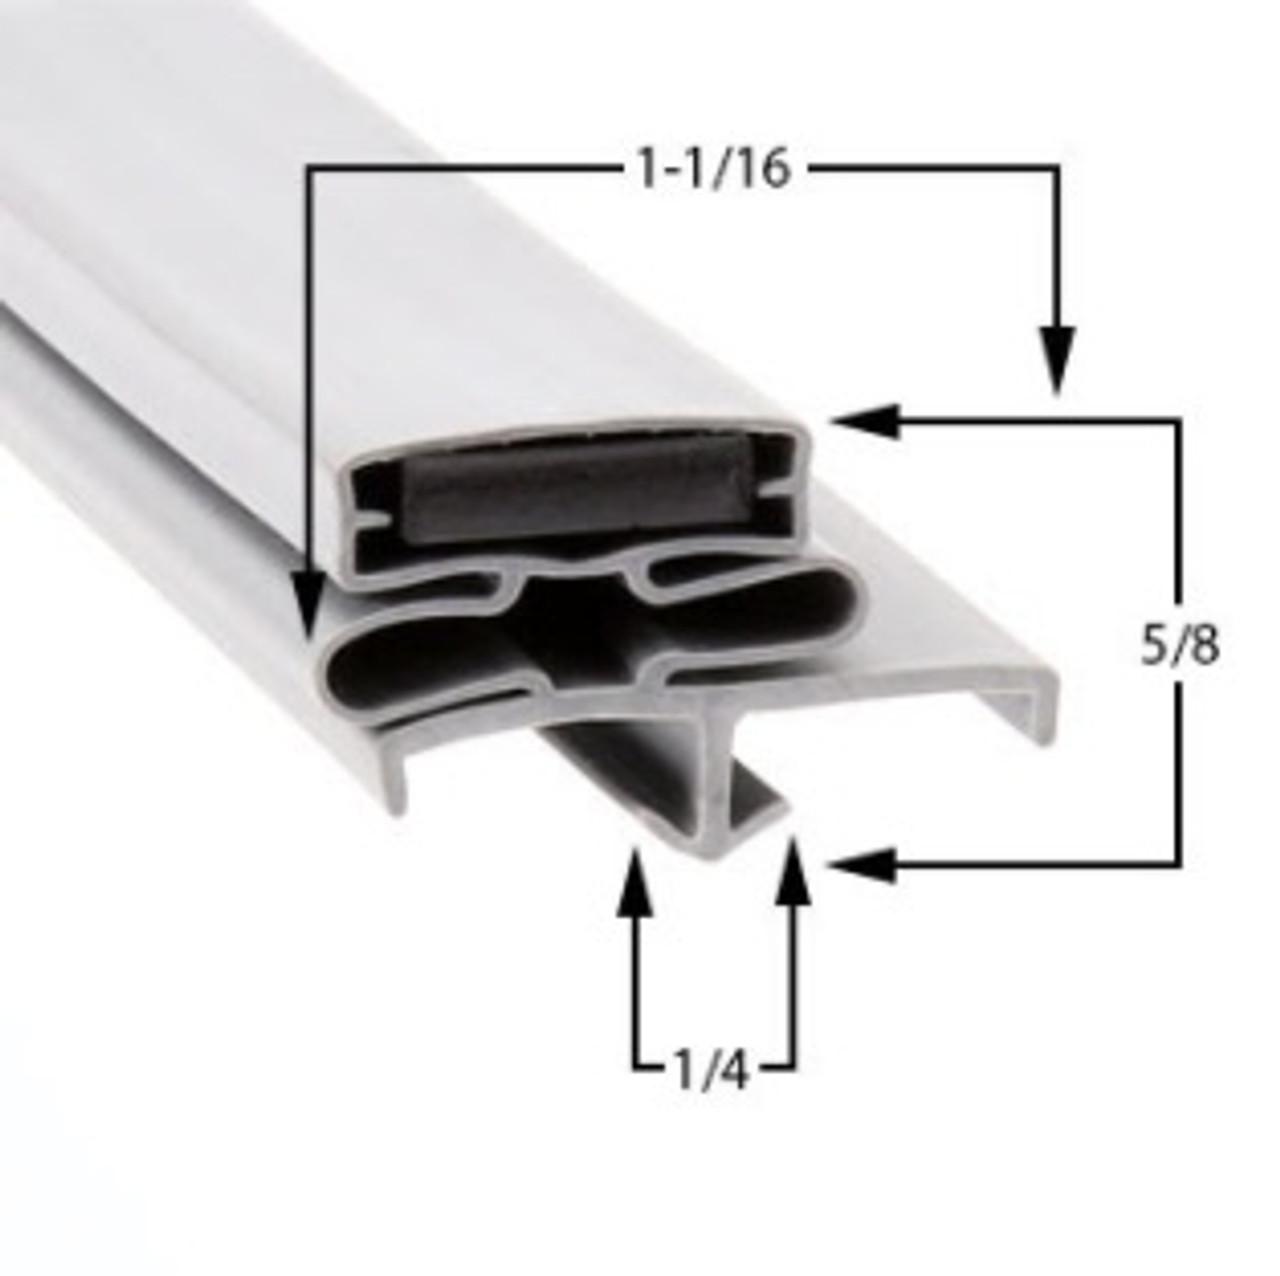 Delfield Door Gasket Profile 168 24 1/2 x 29 1/4 -A2.0901-2